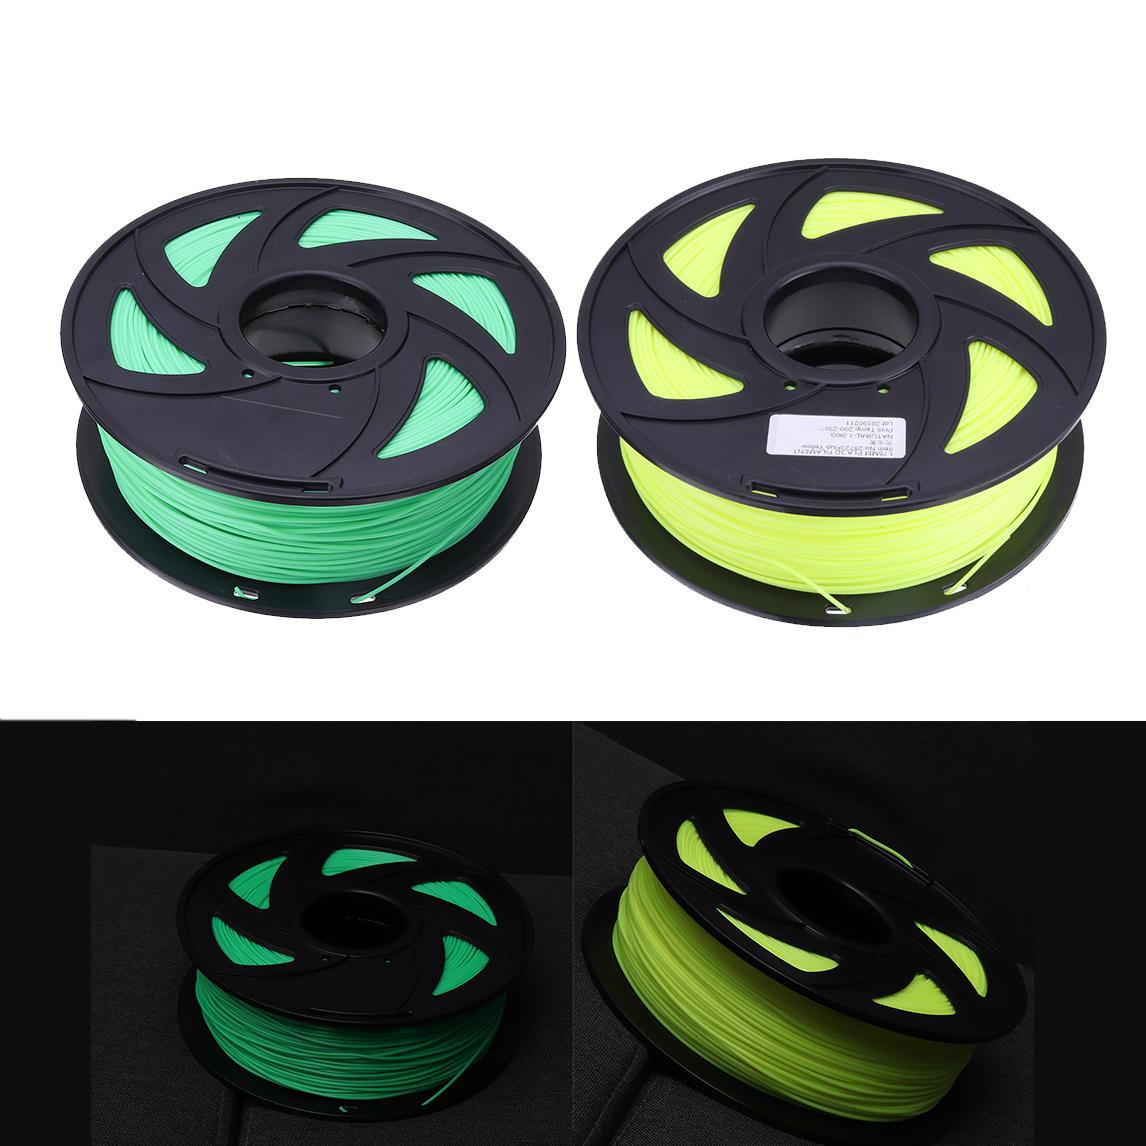 Fluorescence Yellow/Fluorescence Green 1.75mm 1KG/Roll PLA Filament for 3D Printer